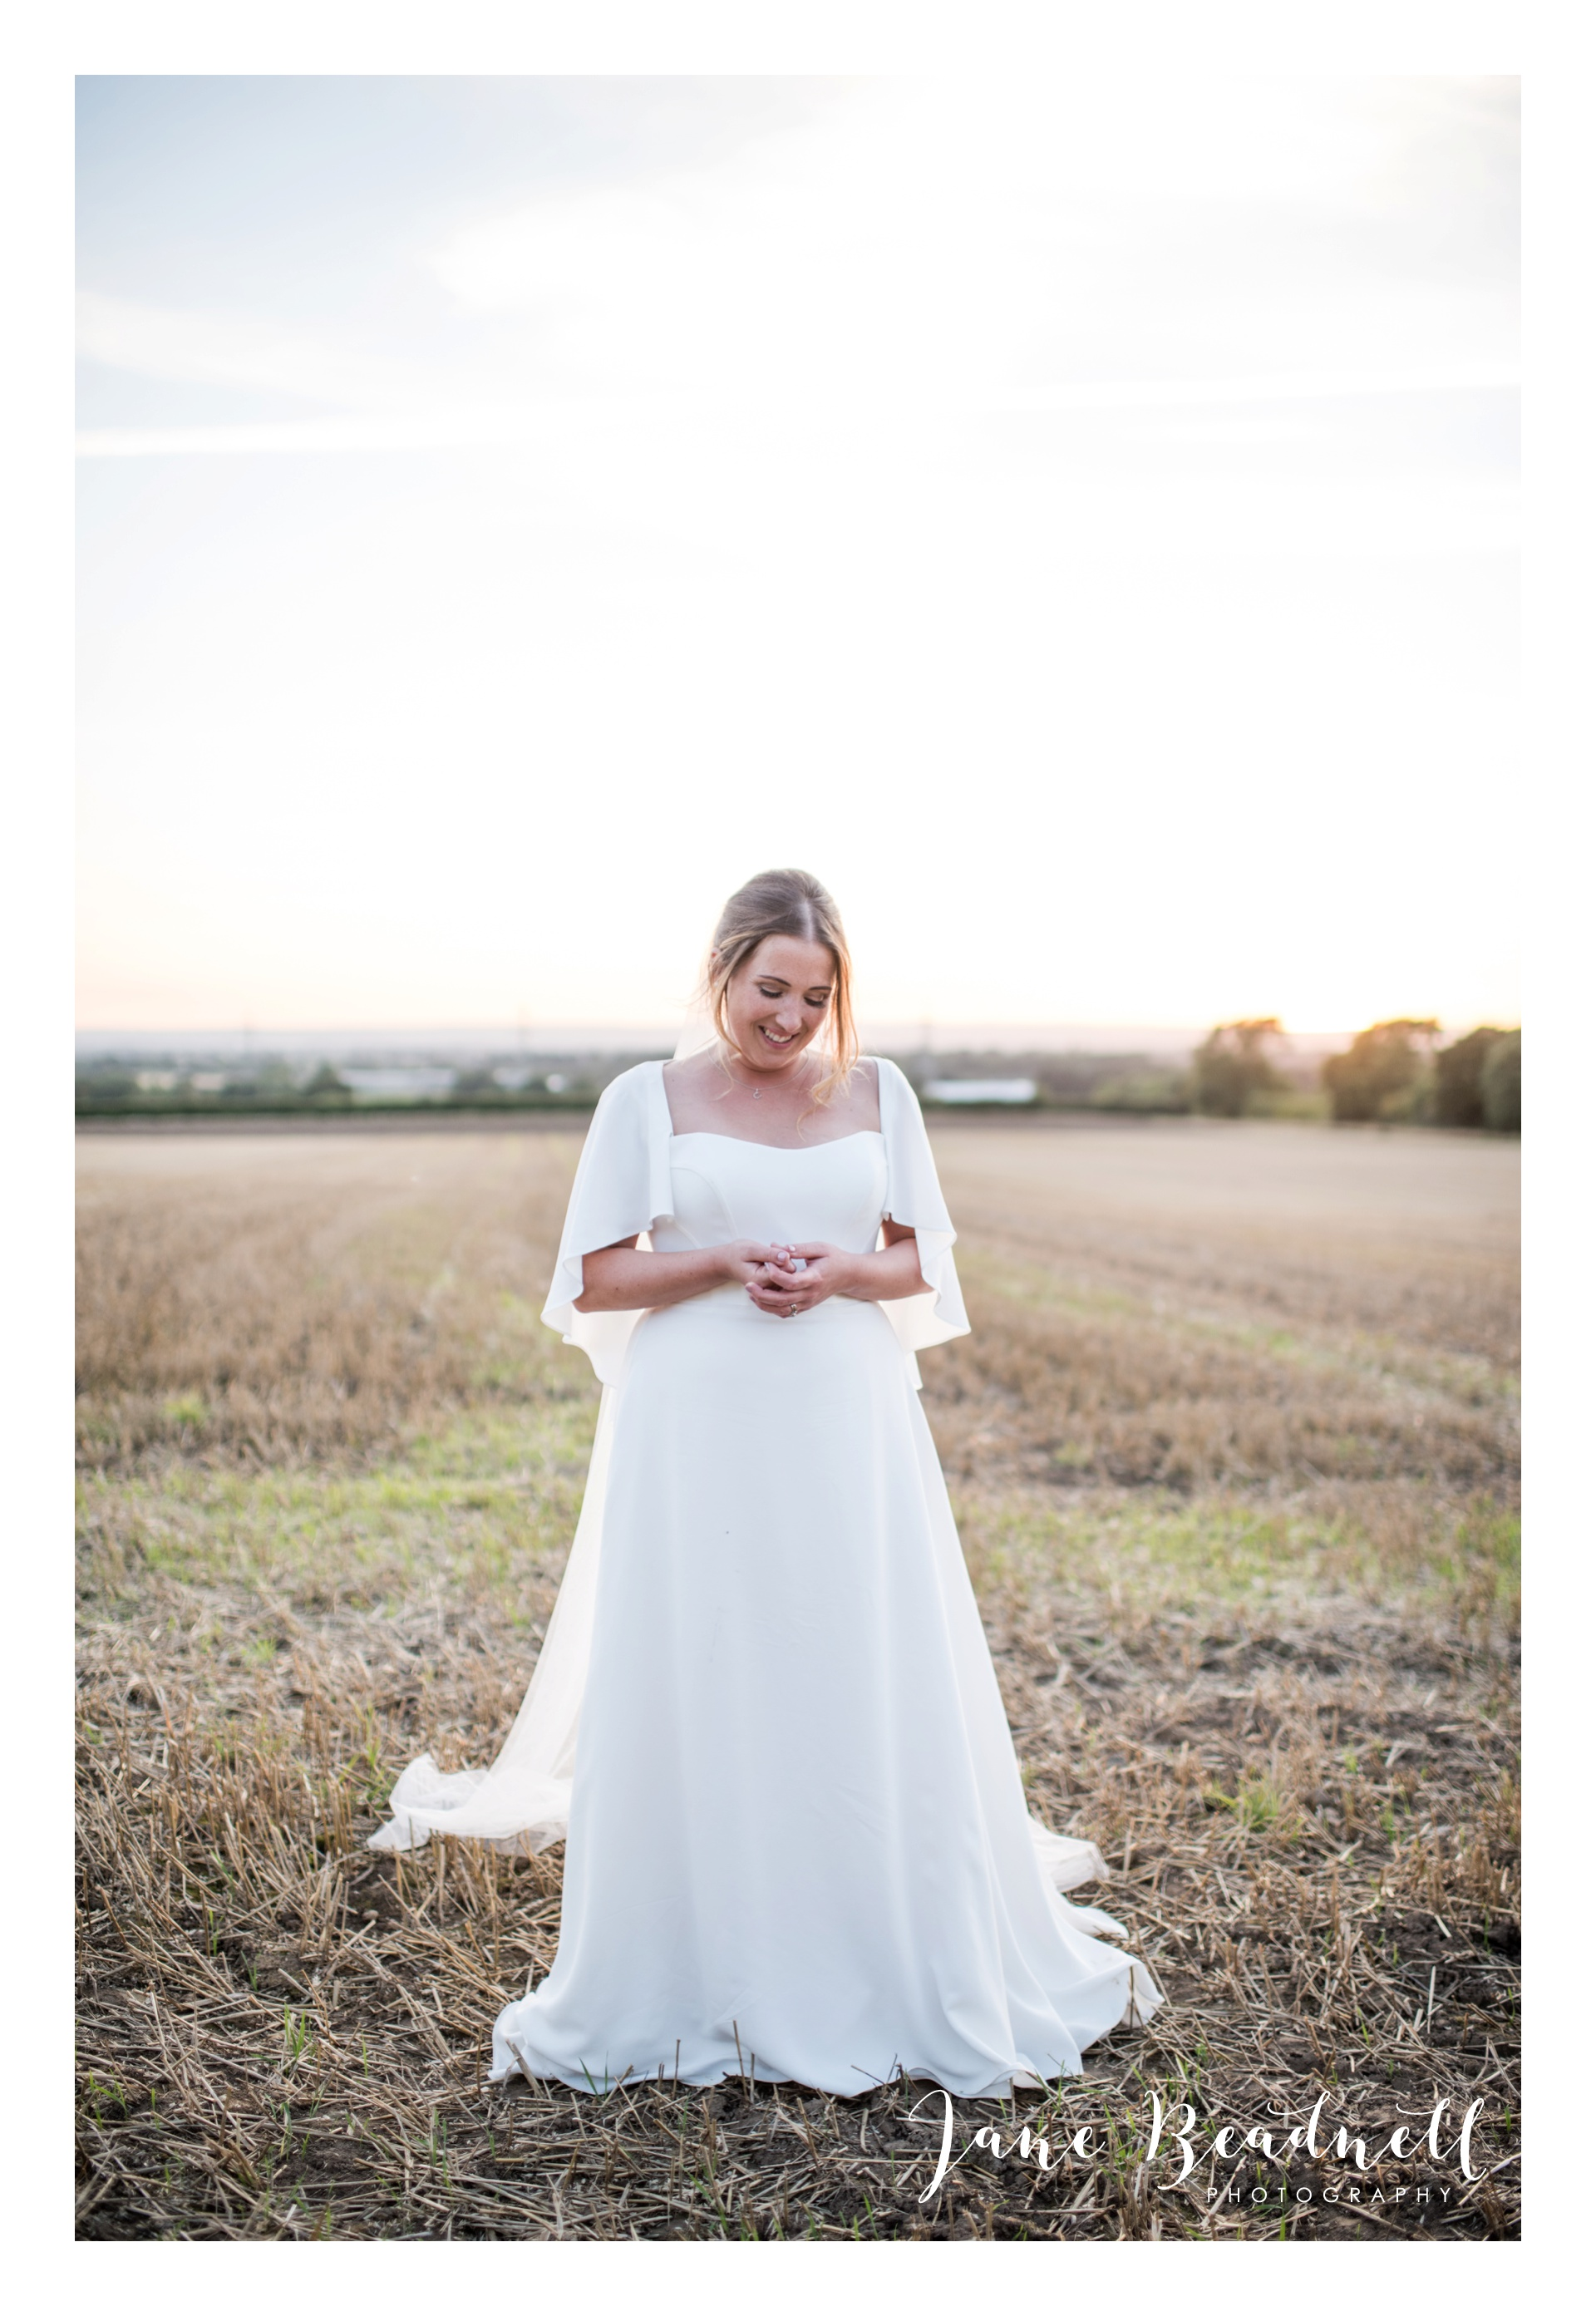 yorkshire-fine-art-wedding-photographer-jane-beadnell-photography_0018